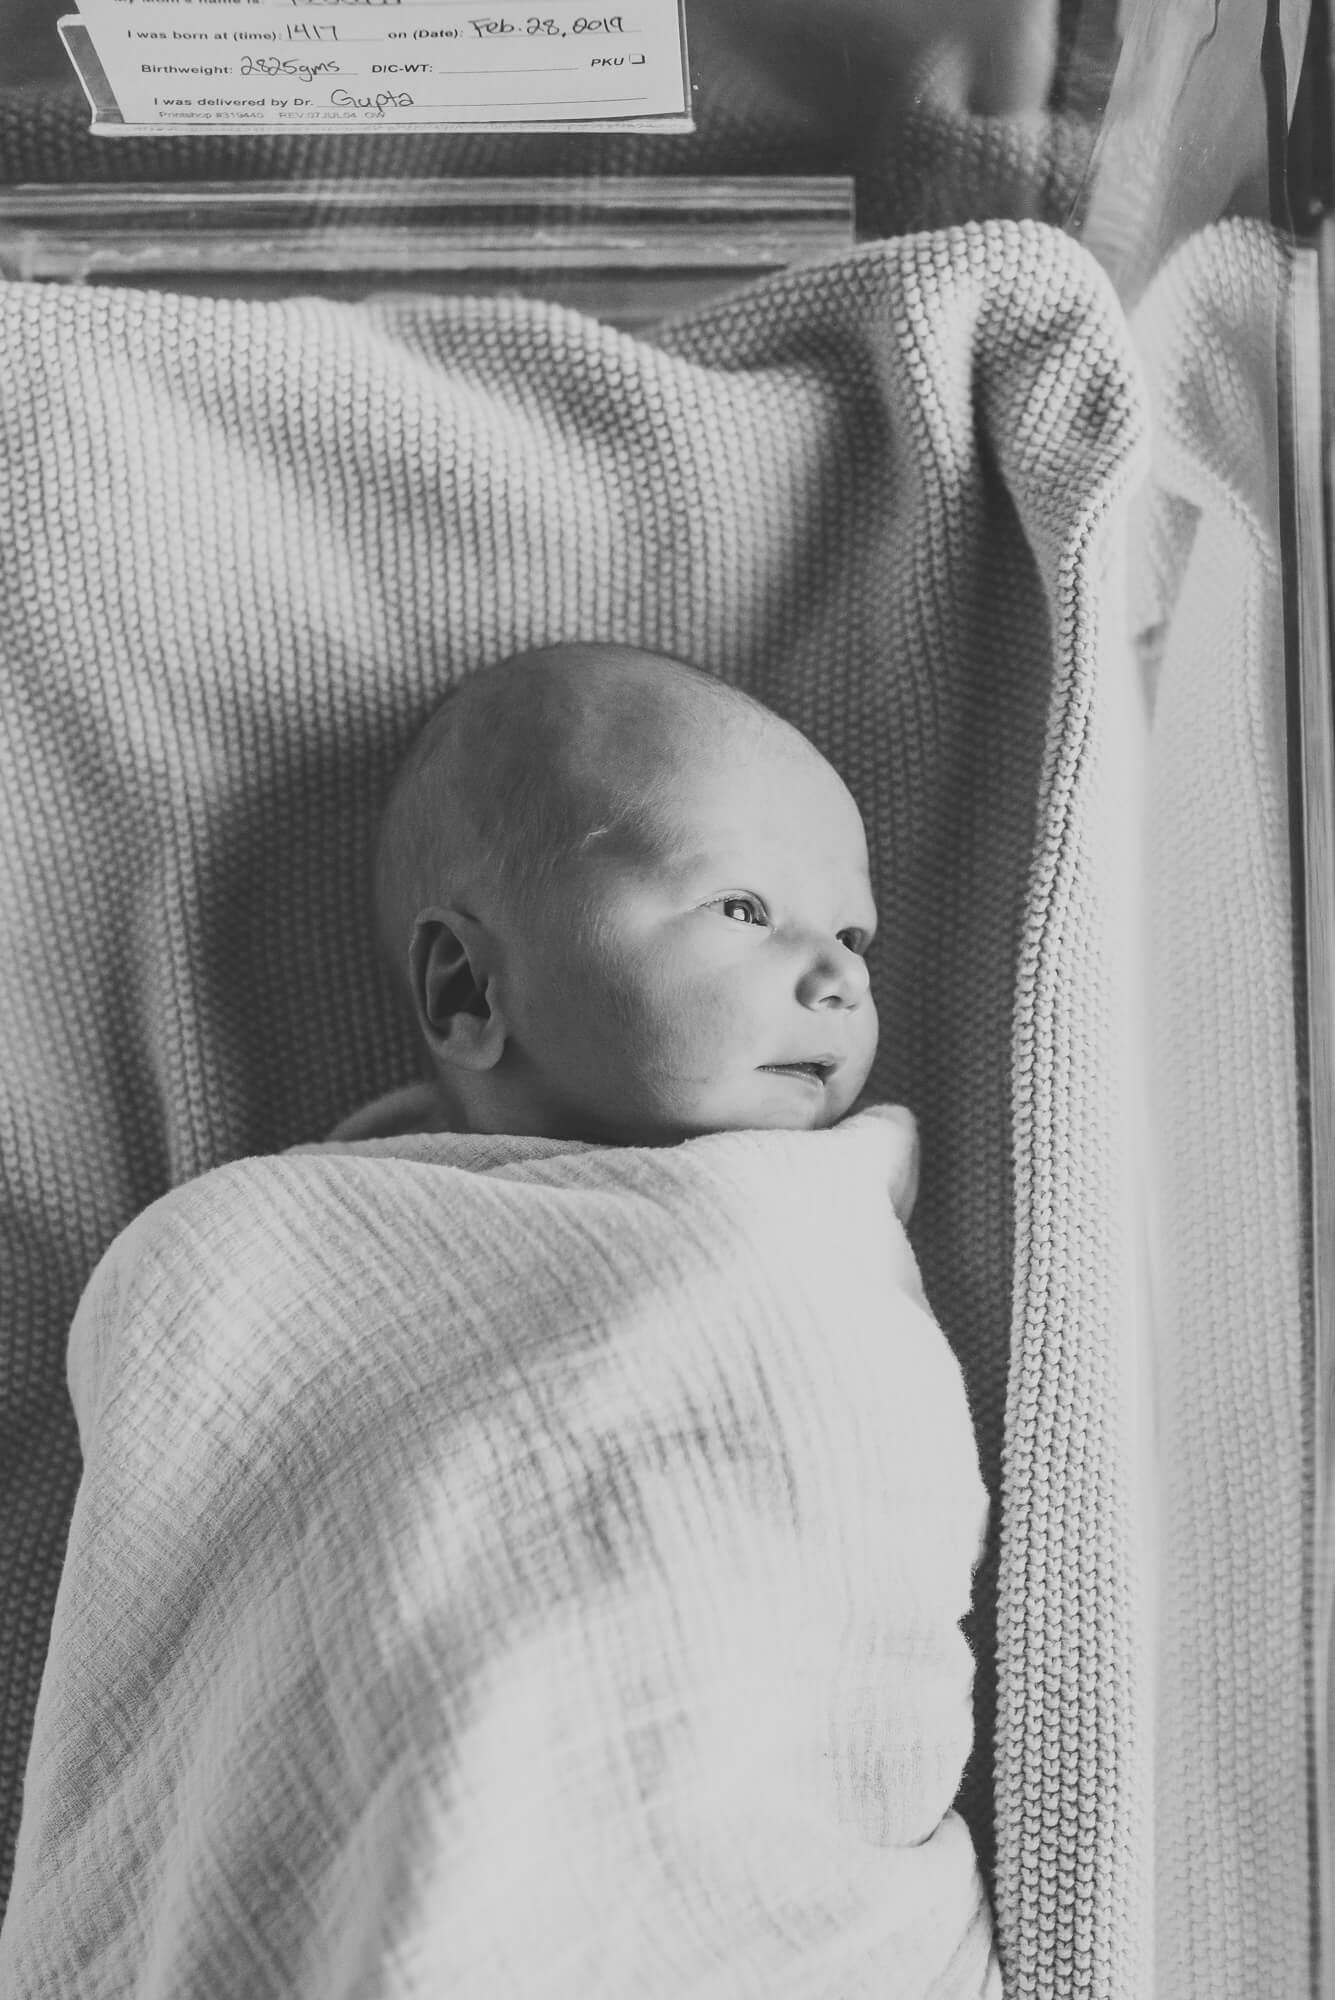 newborn looking wistful